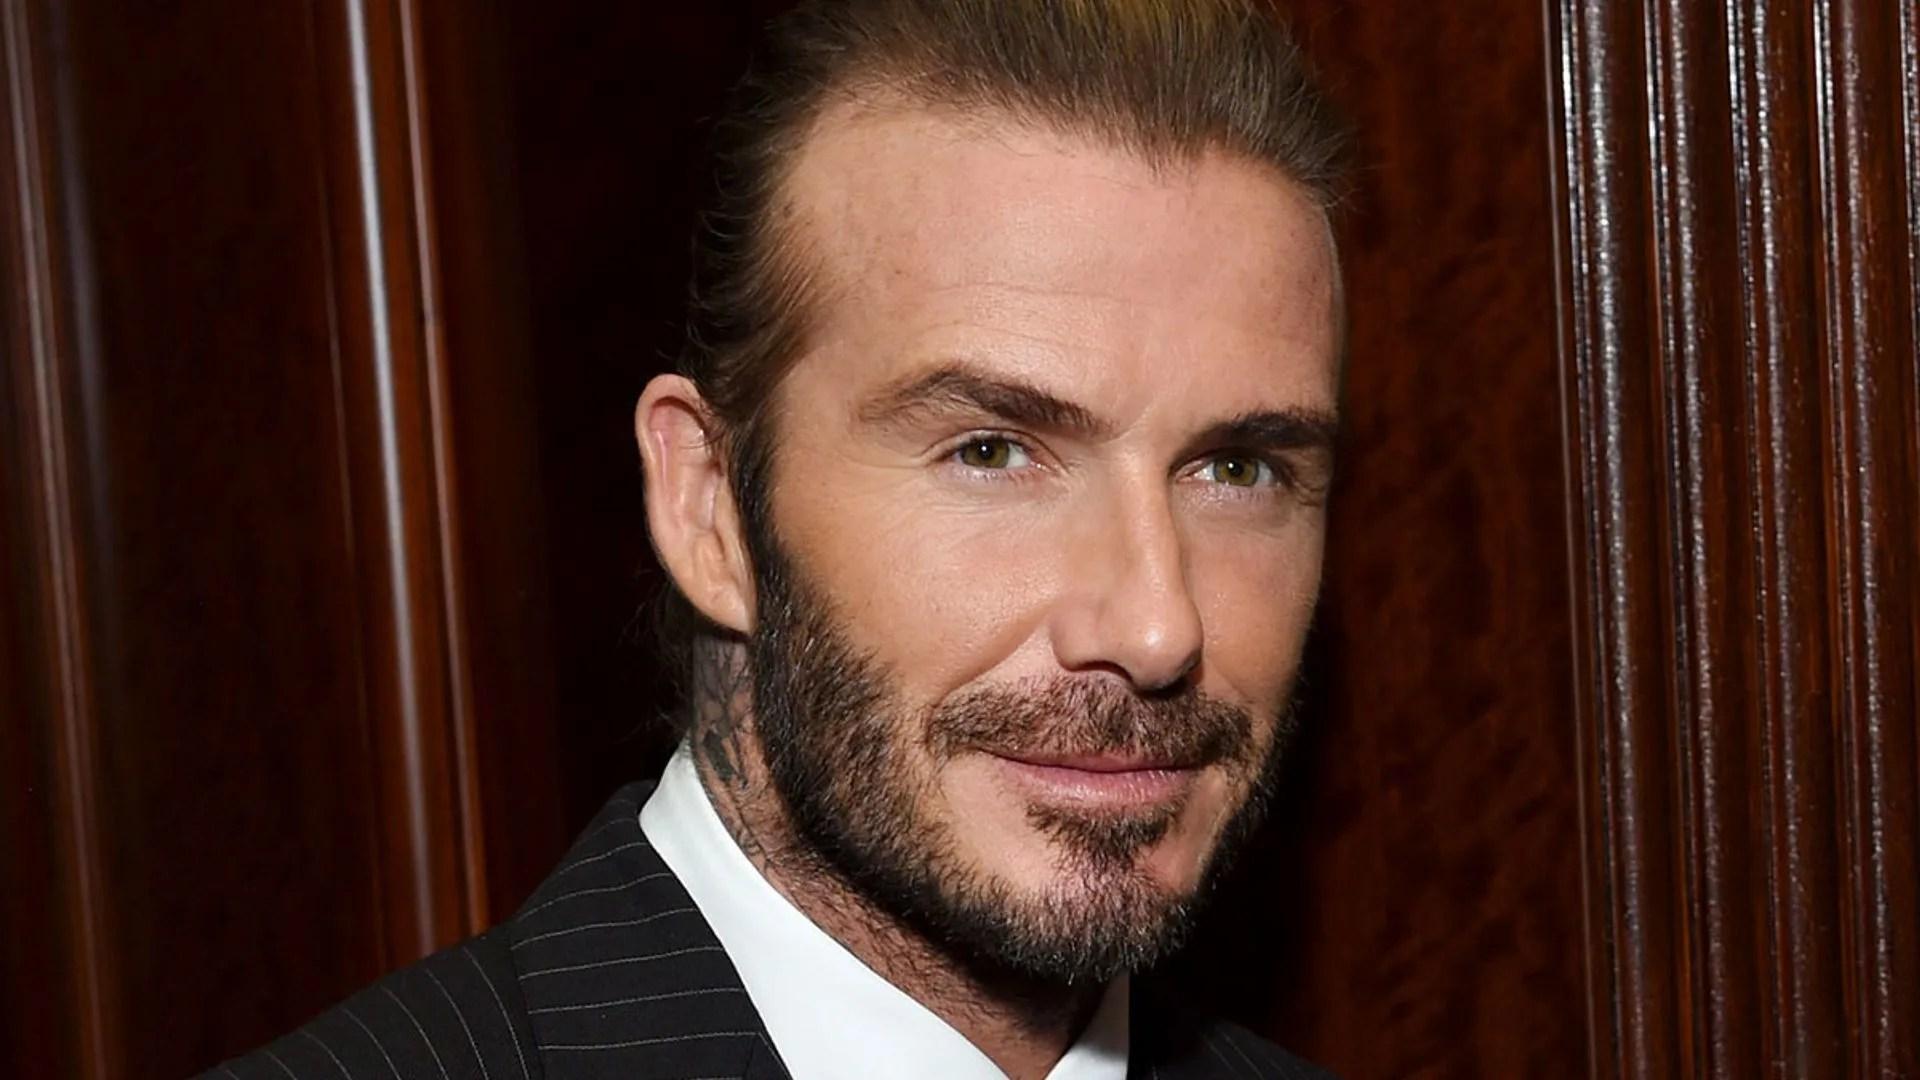 David Beckham mourns tragic death with emotional message ...